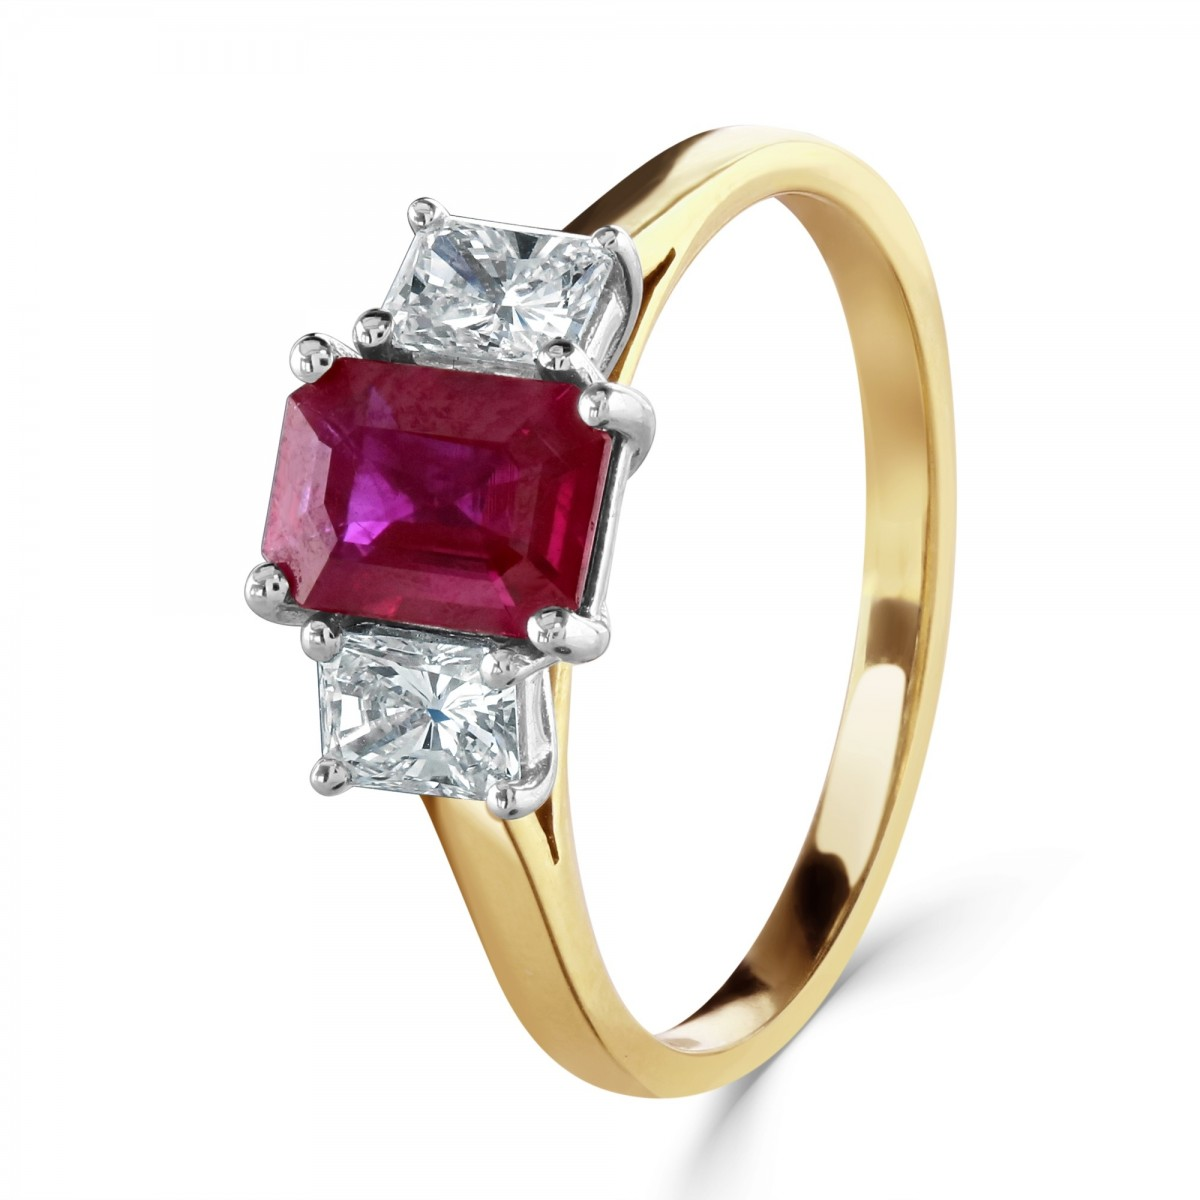 18ct Yellow Gold Emerald Cut Ruby & Diamond Three Stone Ring